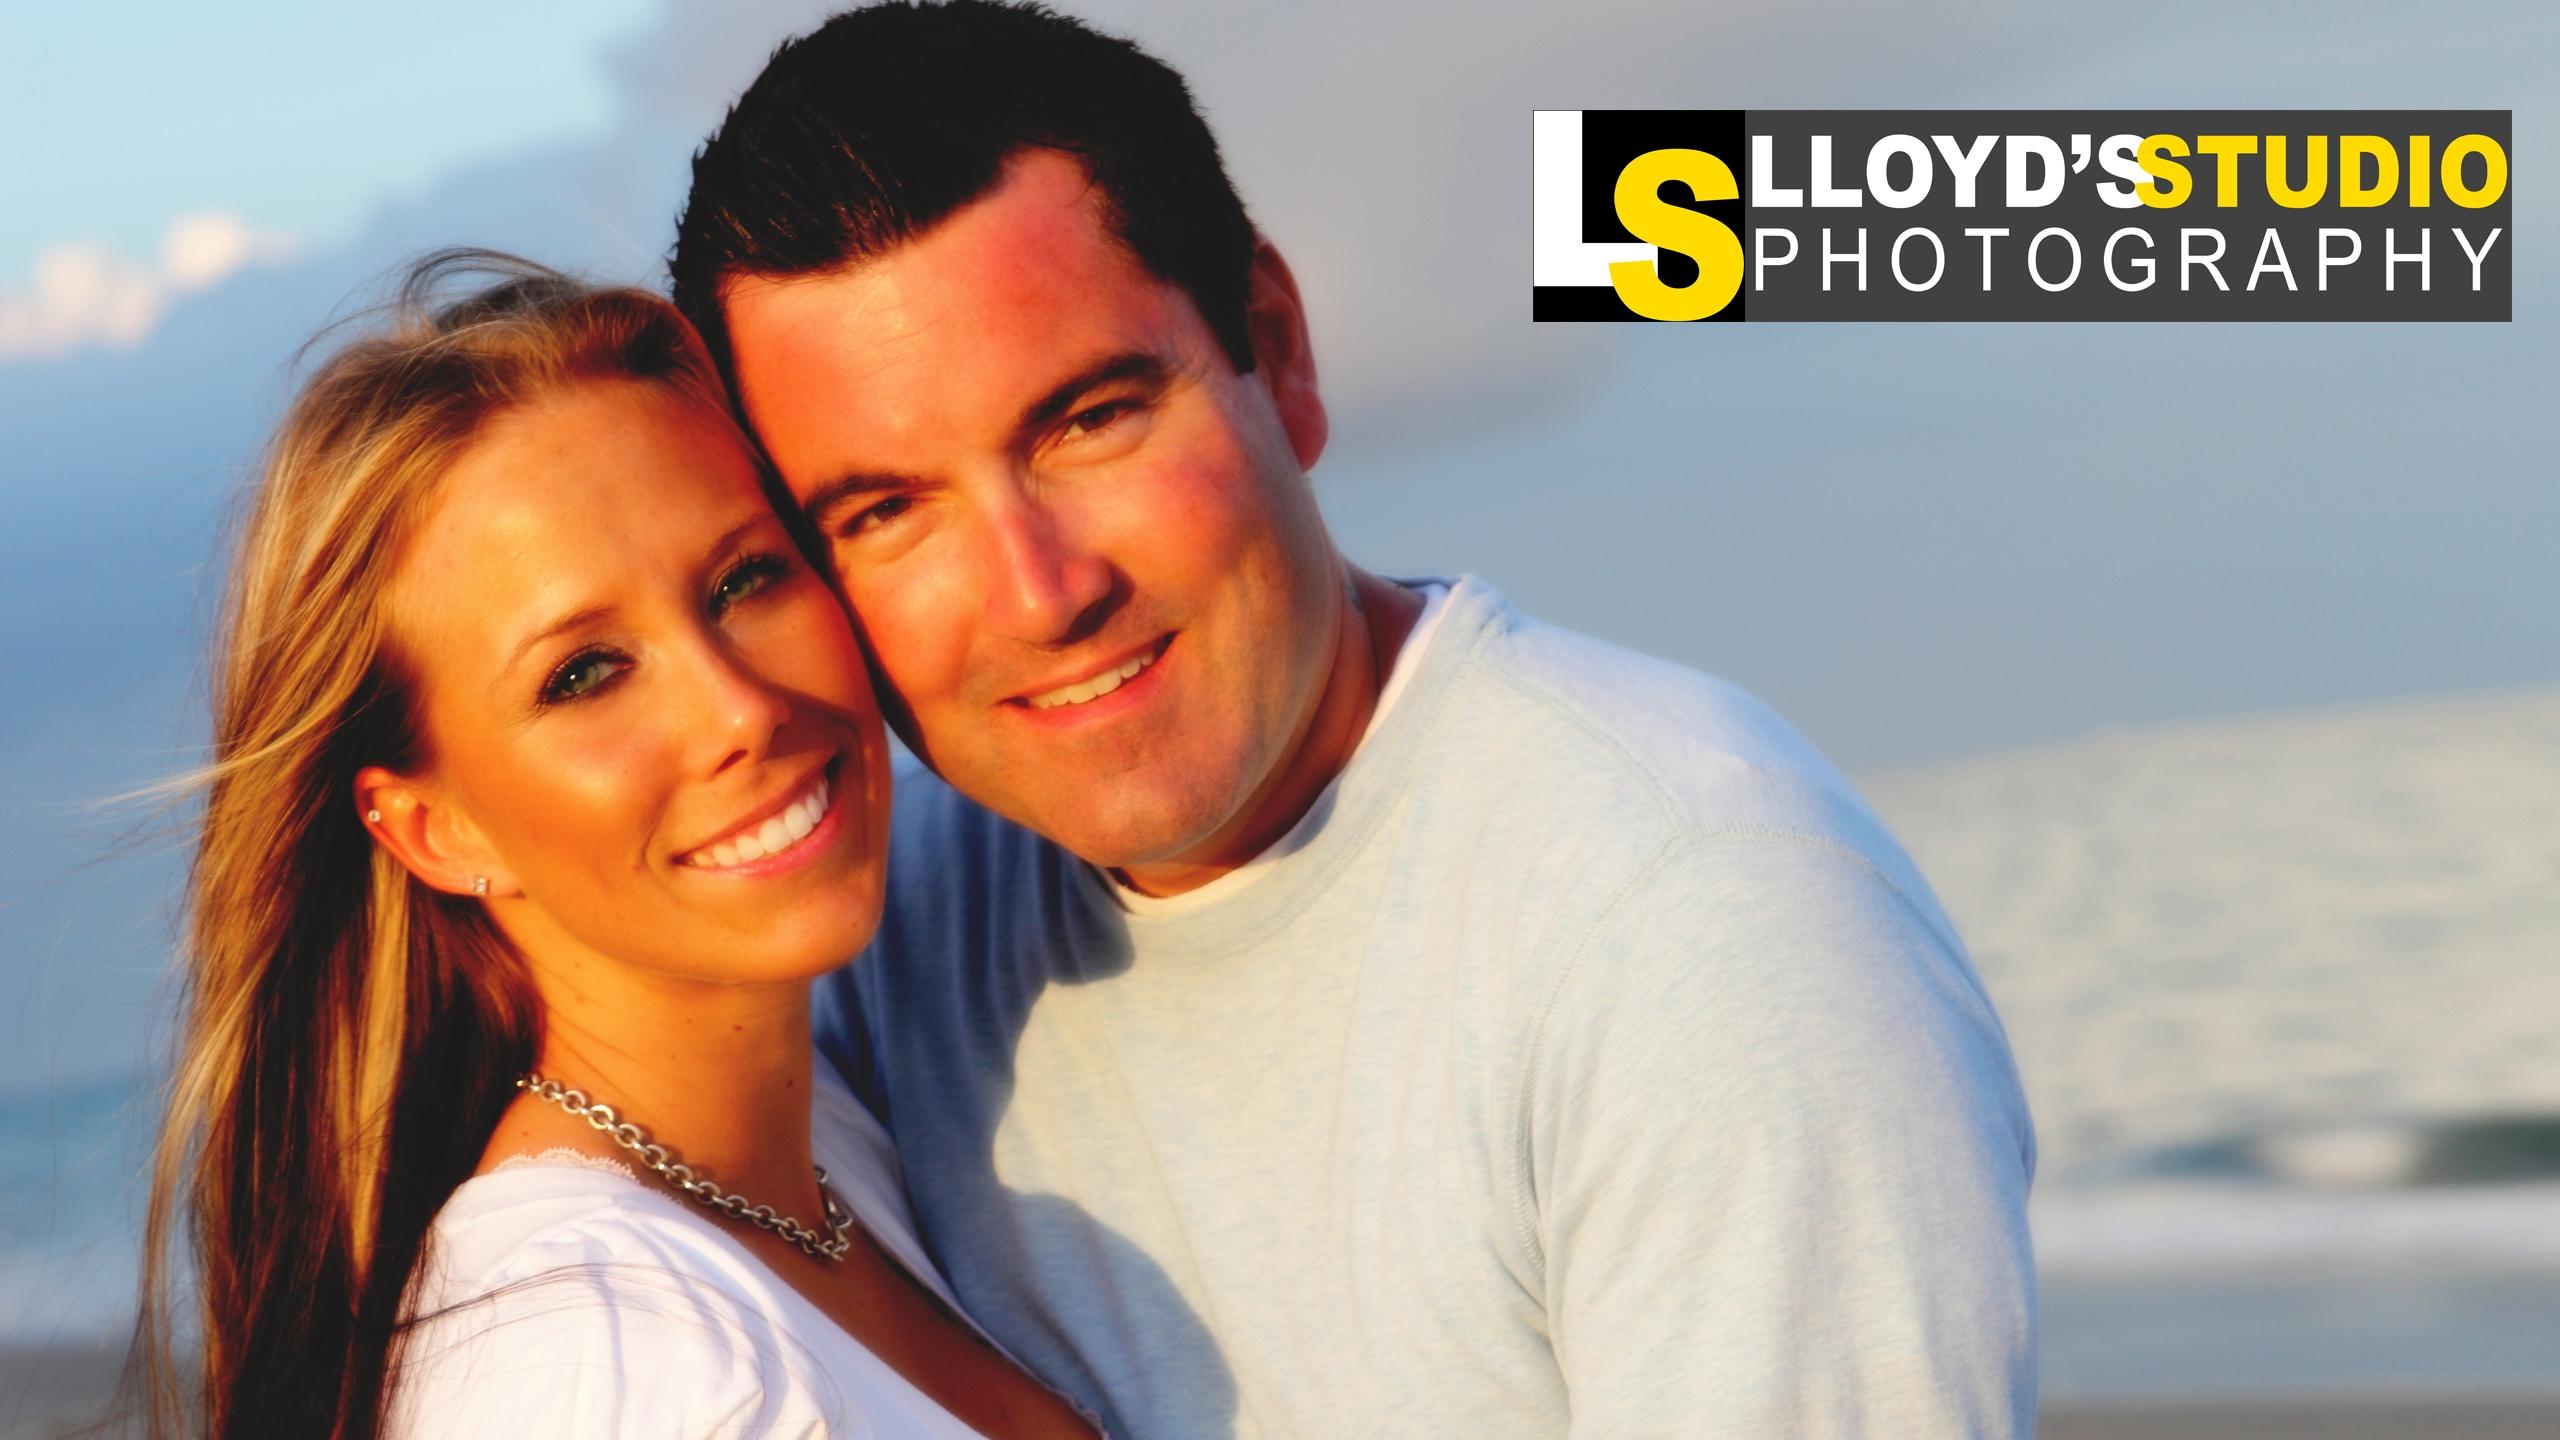 Lloyd's Studio Photography (@lloydsstudiophotography) Cover Image